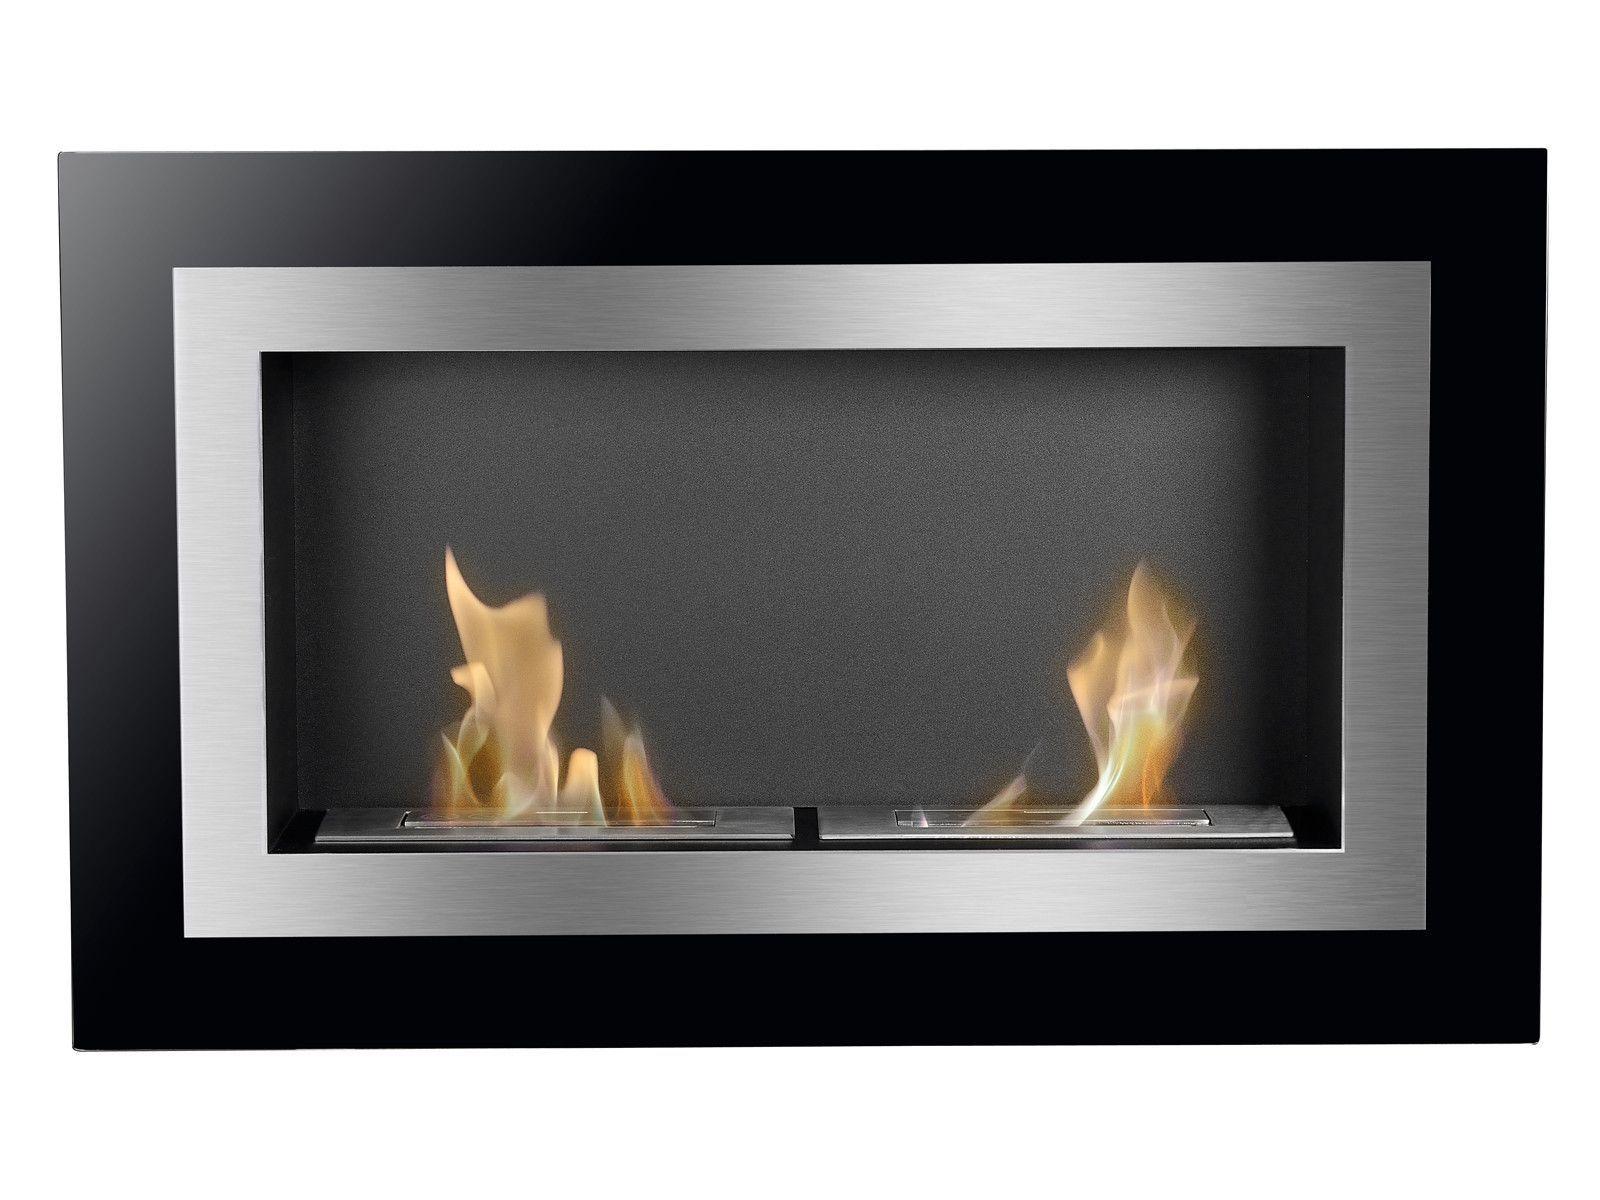 Villa Wall Mounted Ventless Ethanol Fireplace Ethanol Fireplace Bioethanol Fireplace Fireplace